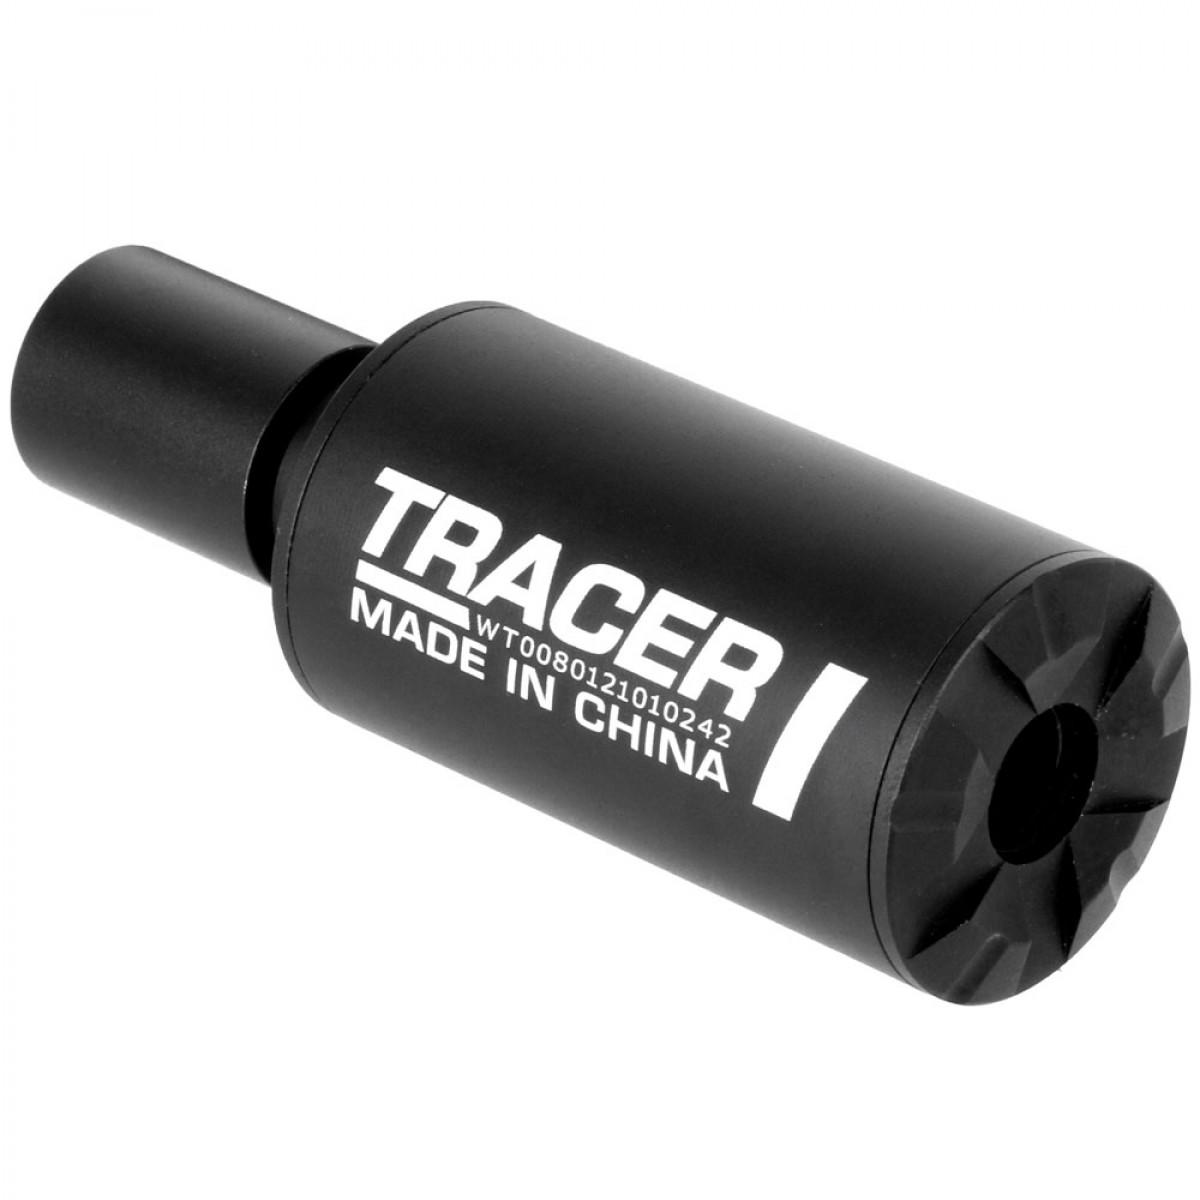 ANS Optical 高出力 UV トレーサー フルオートトレーサー 10mm正ネジ 14mm逆ネジアダプター付き サバイバルゲーム 室内 夜戦